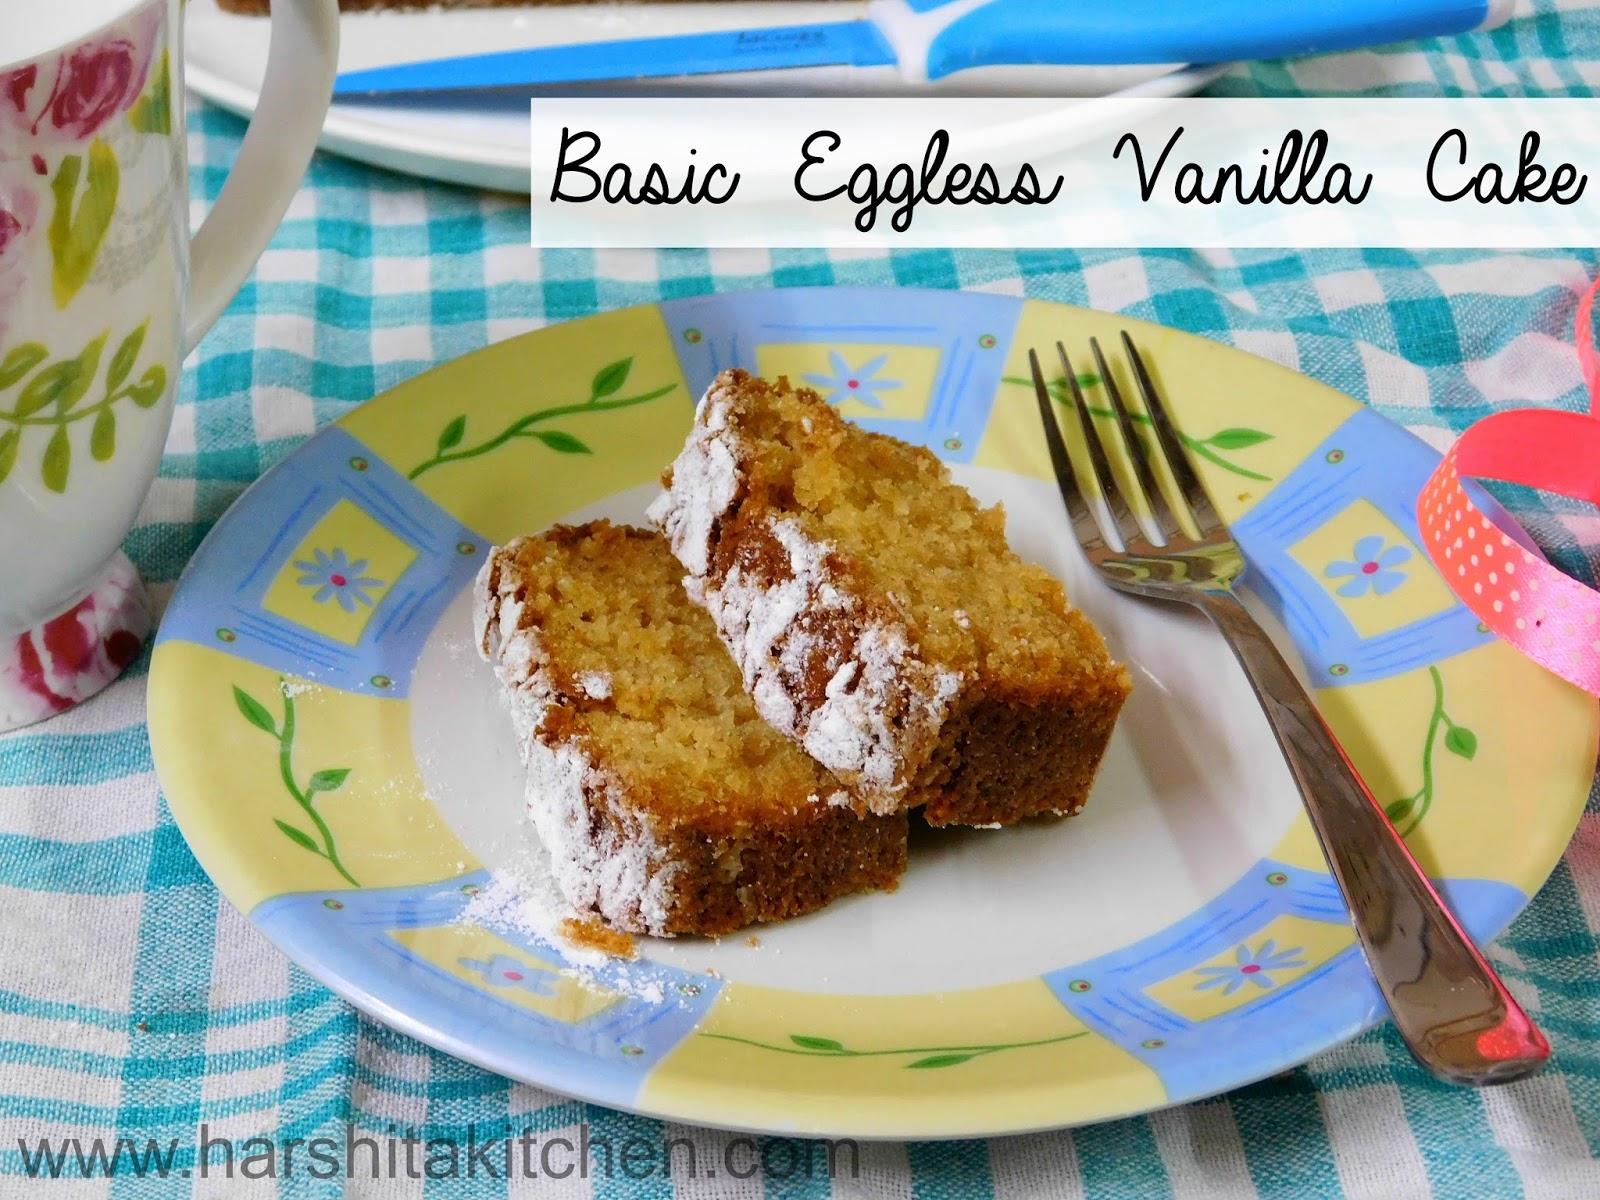 Harshita's Kitchen: Eggless Vanilla Cake in Microwave - Simple ...